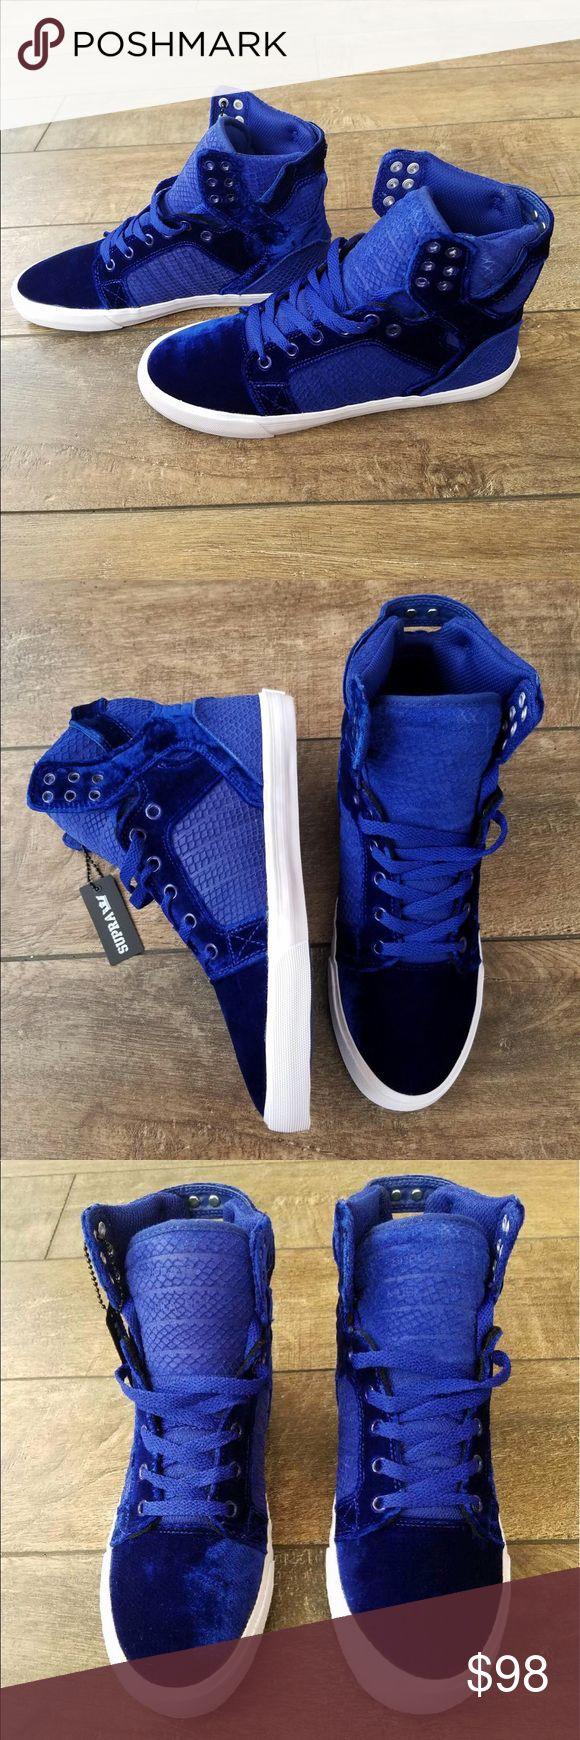 Selling this Supra Skytop Royal- White Blue Velvet Sneakers on Poshmark! My username is: thegreatimpulse. #shopmycloset #poshmark #fashion #shopping #style #forsale #Supra #Shoes